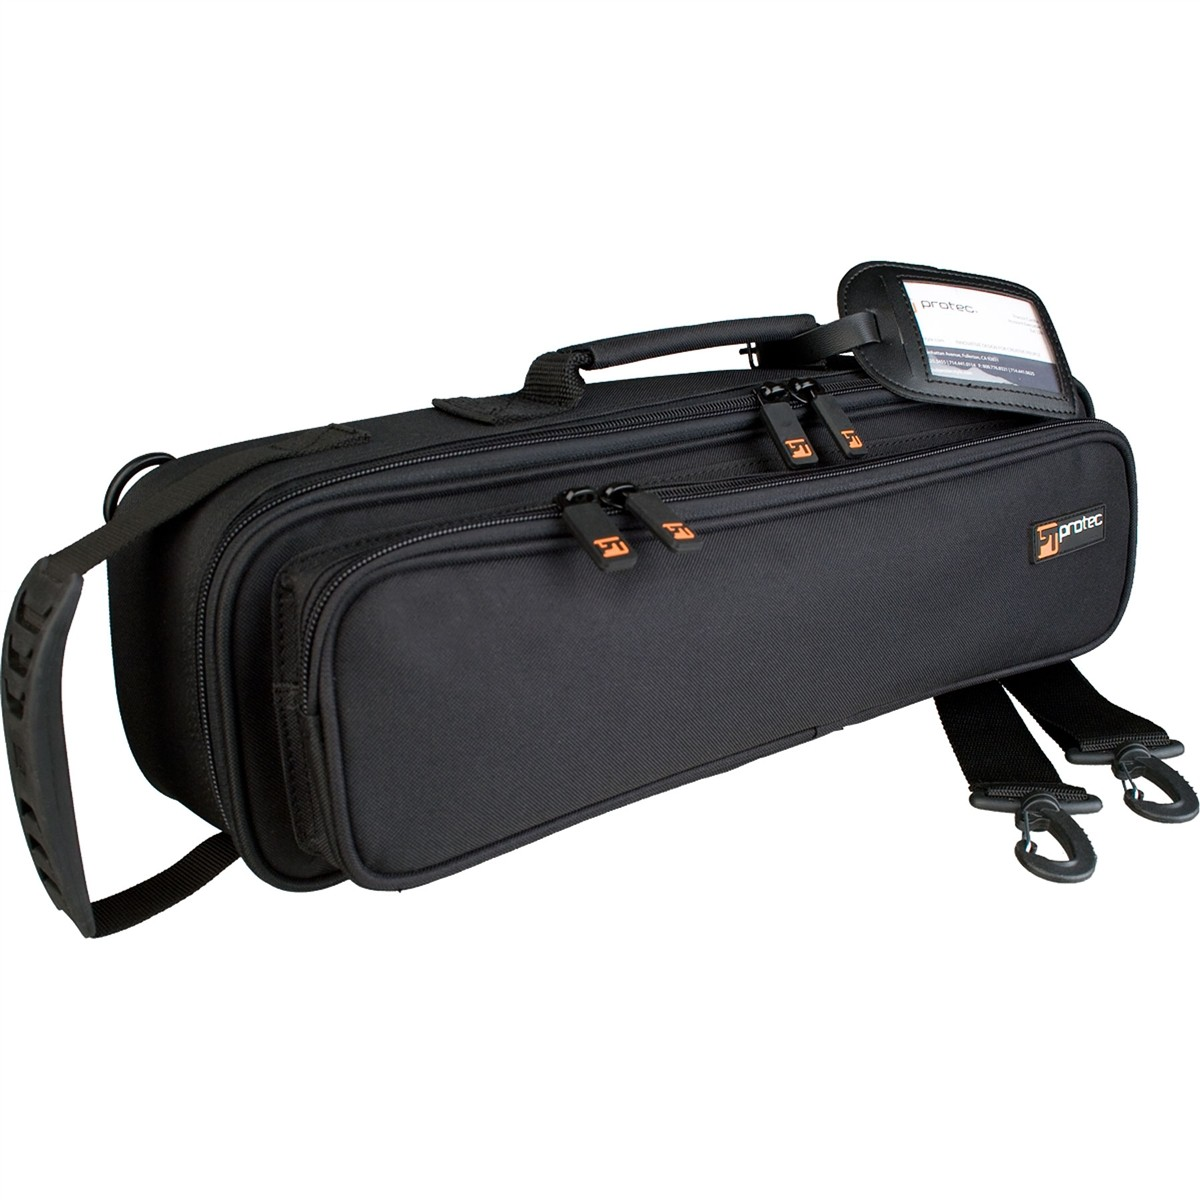 Protec Deluxe Flute Case Cover (Black A308)